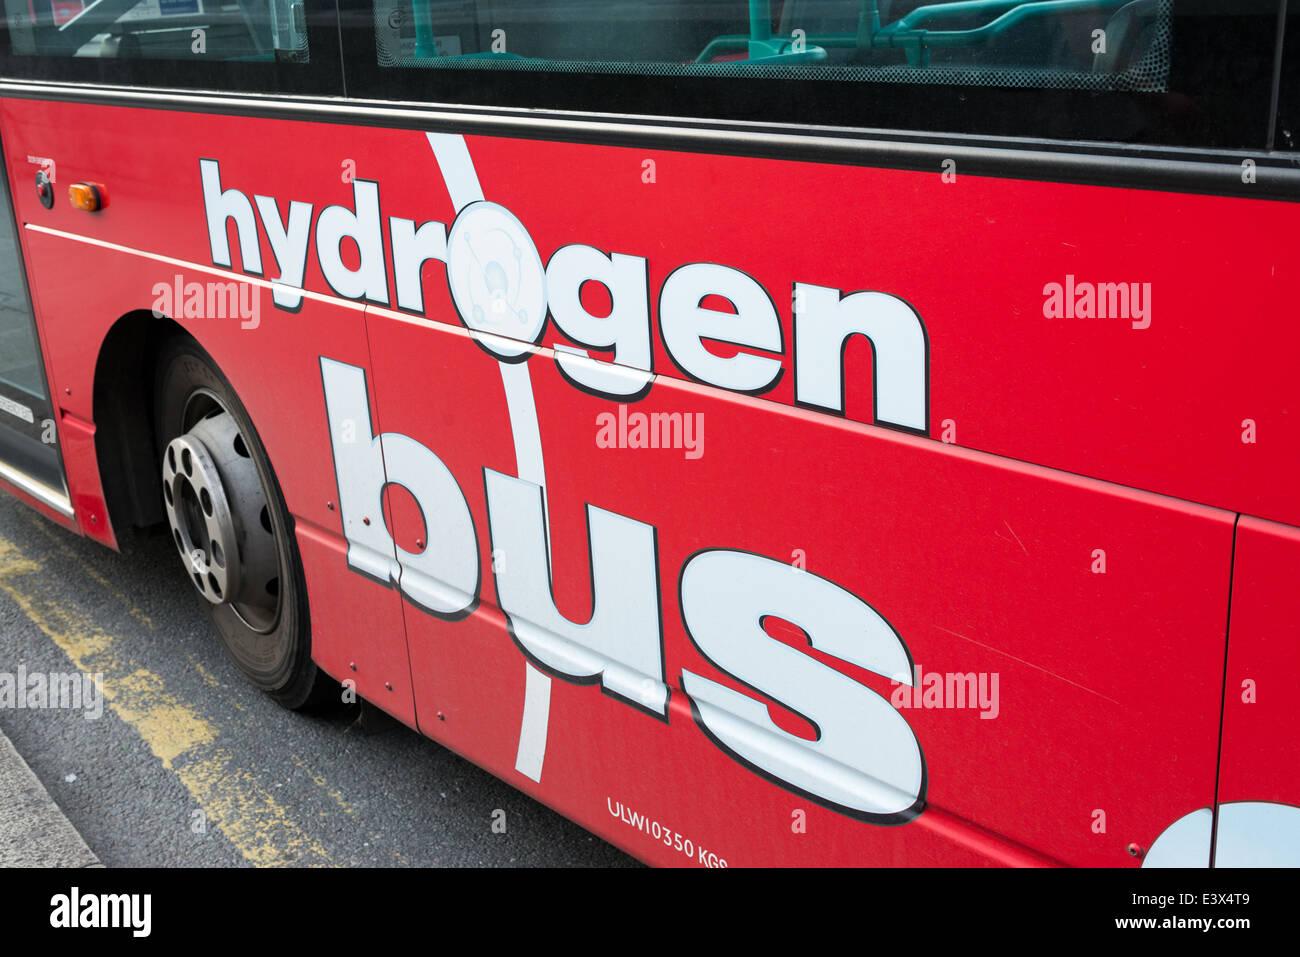 Hydrogen fuel powered bus, London, England, UK - Stock Image